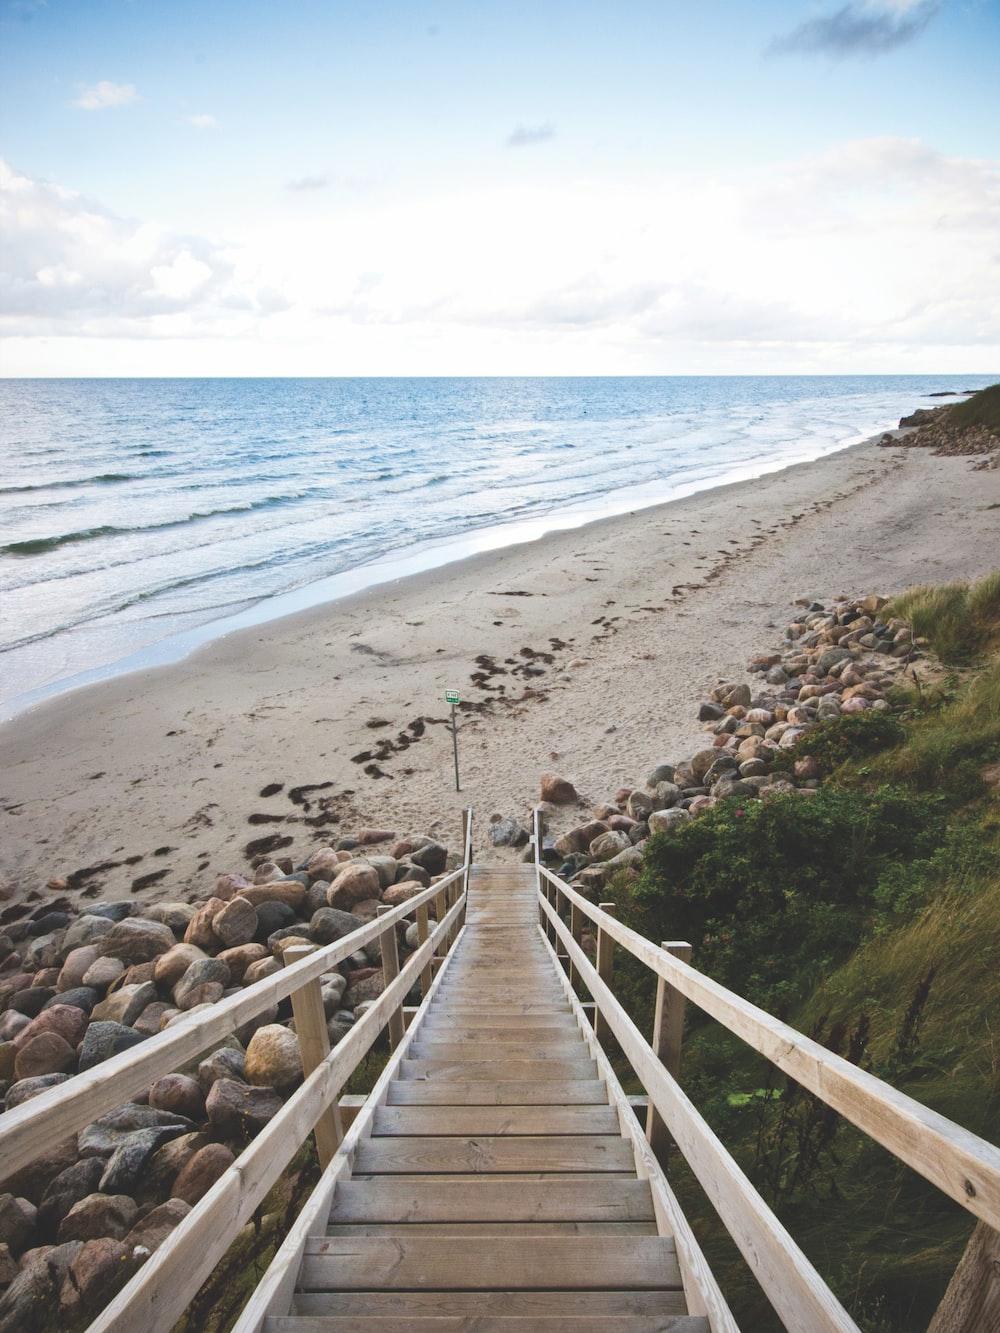 people walking on wooden bridge near beach during daytime